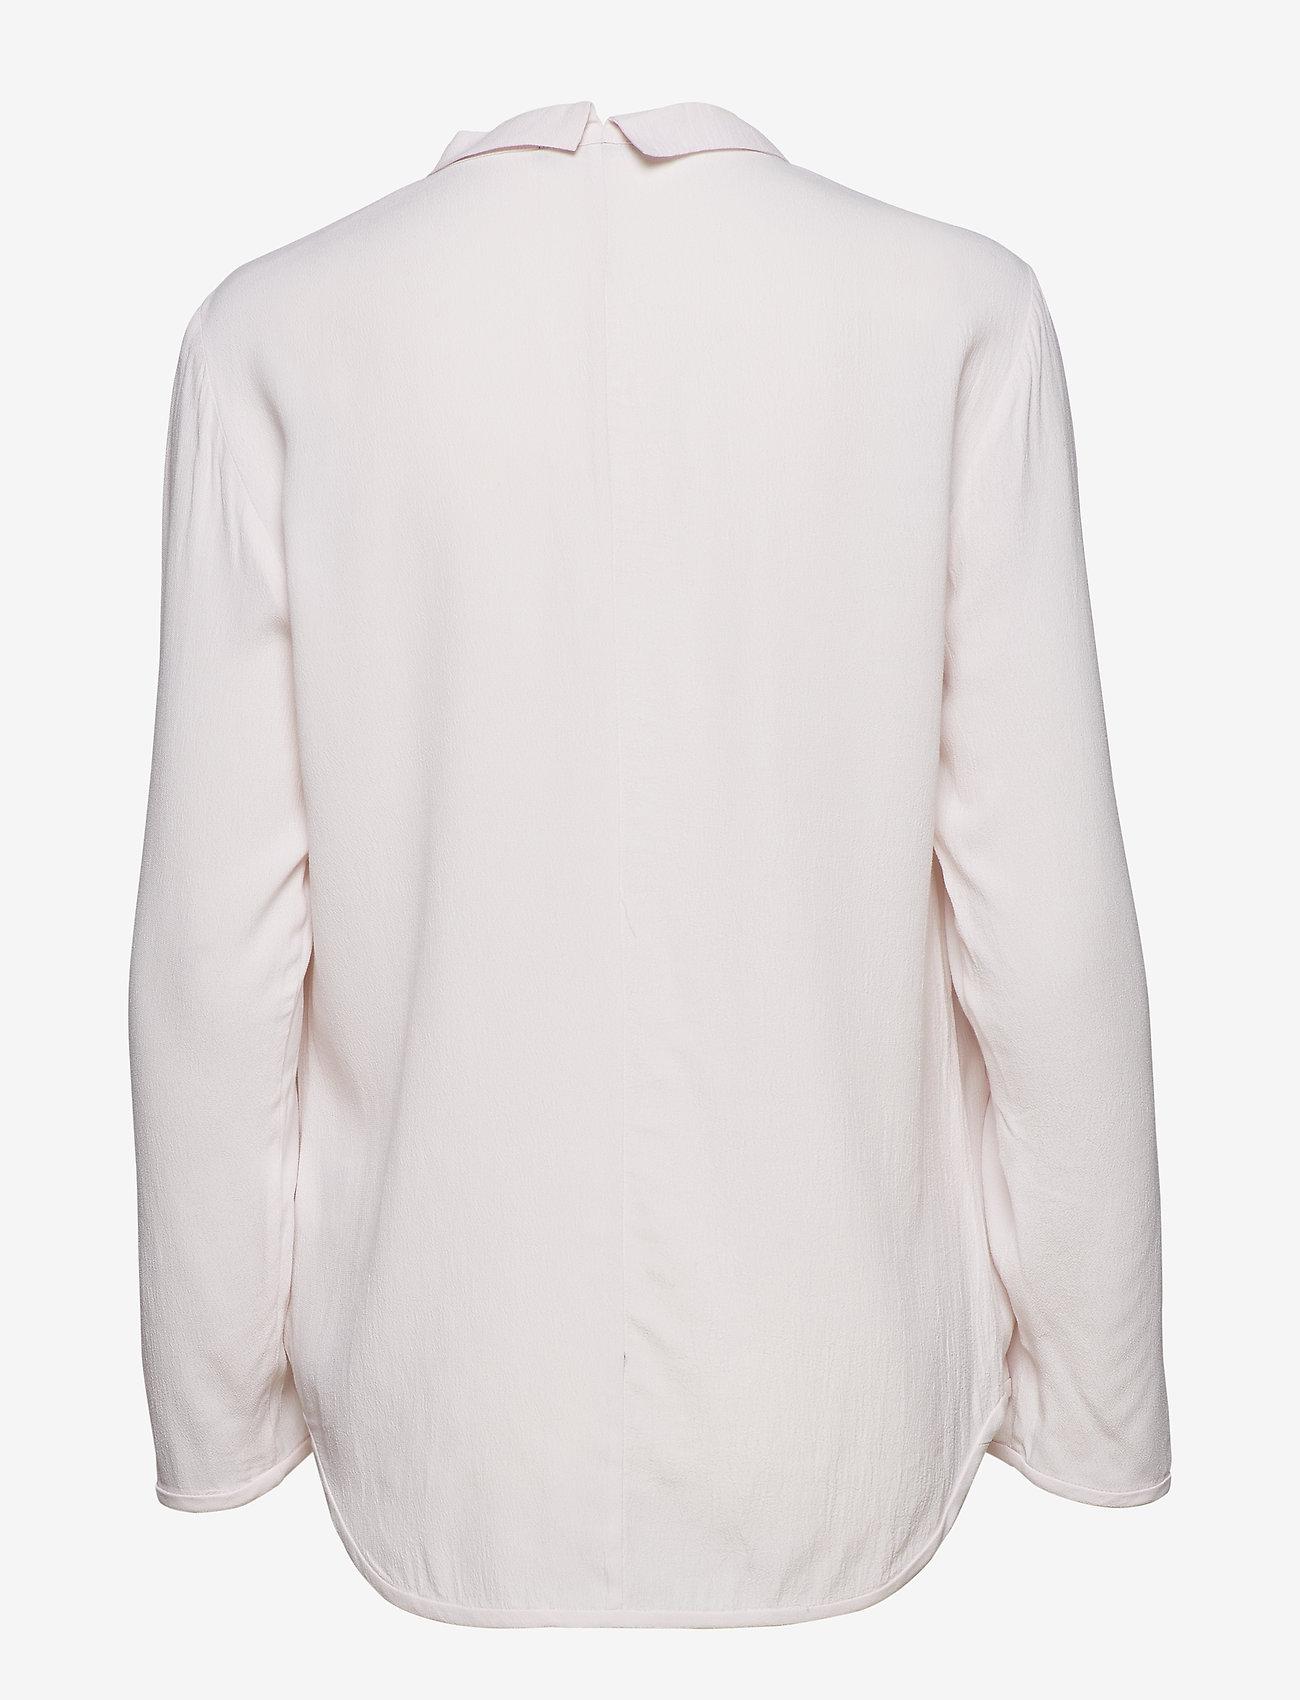 Bruuns Bazaar Liva Top - Blouses & Shirts